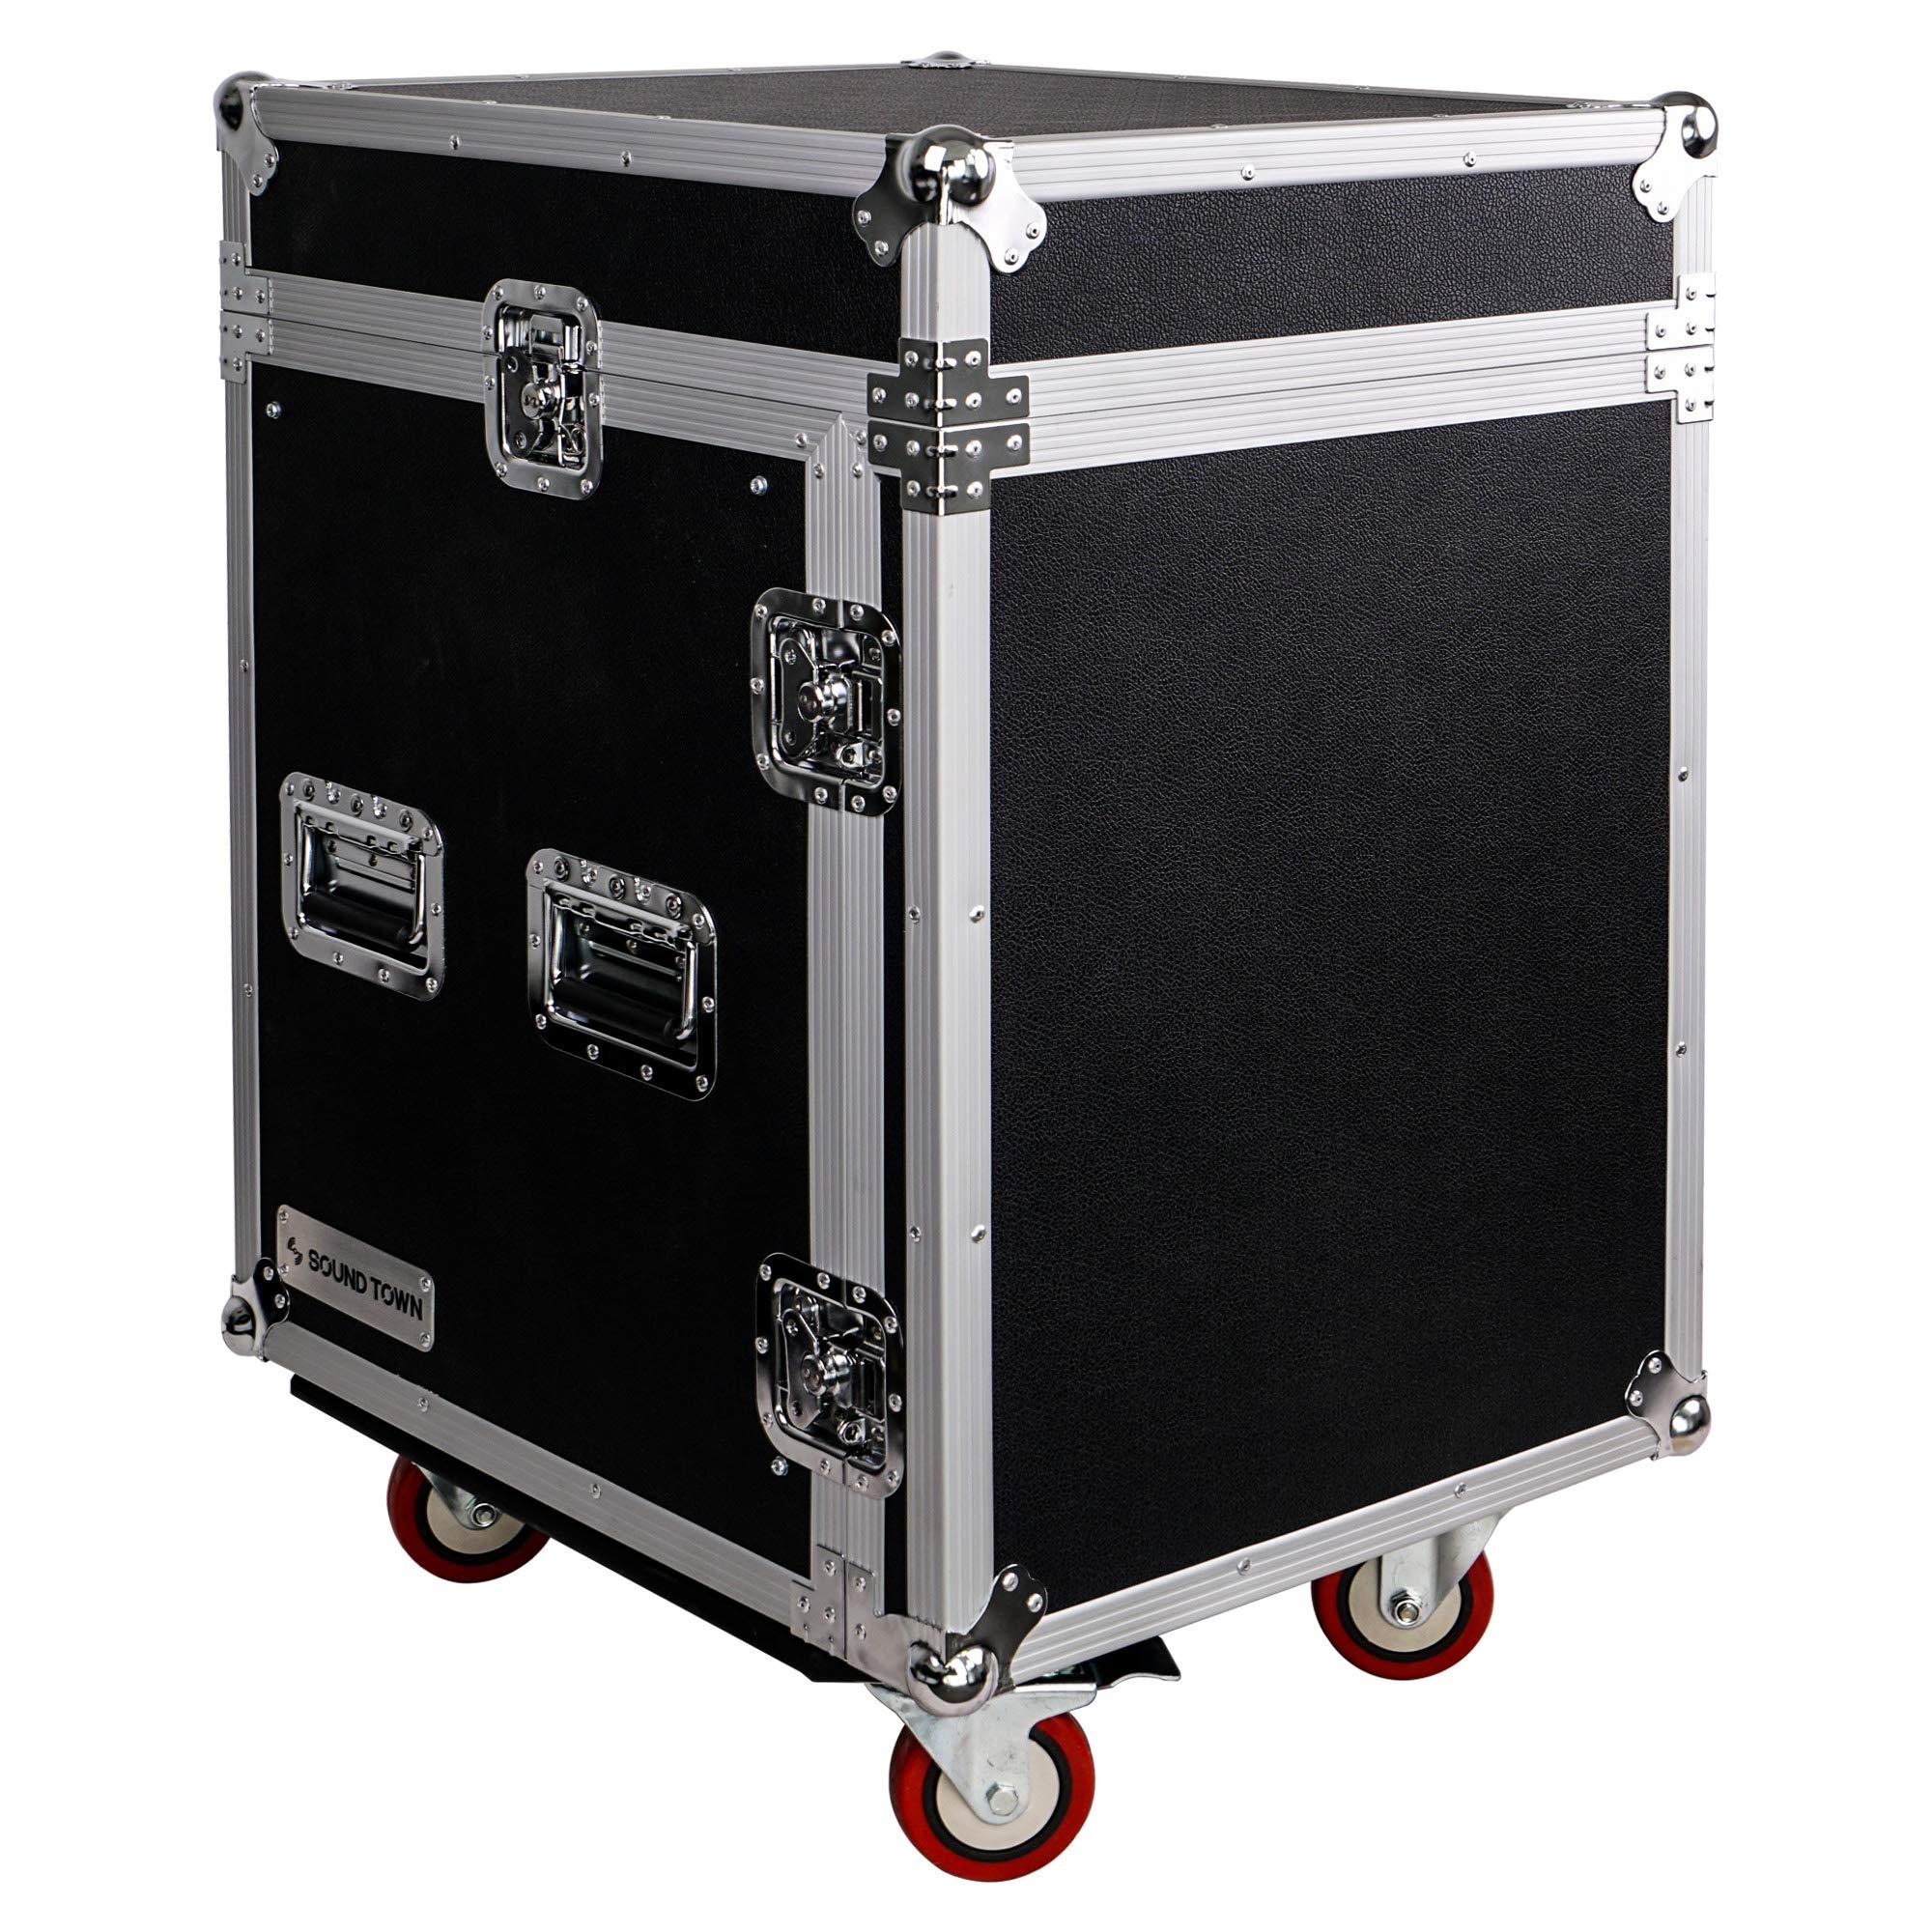 Sound Town 12-Space PA/DJ Pro Audio Rack/Road Case with Slant Mixer Top (STMR-12UW)